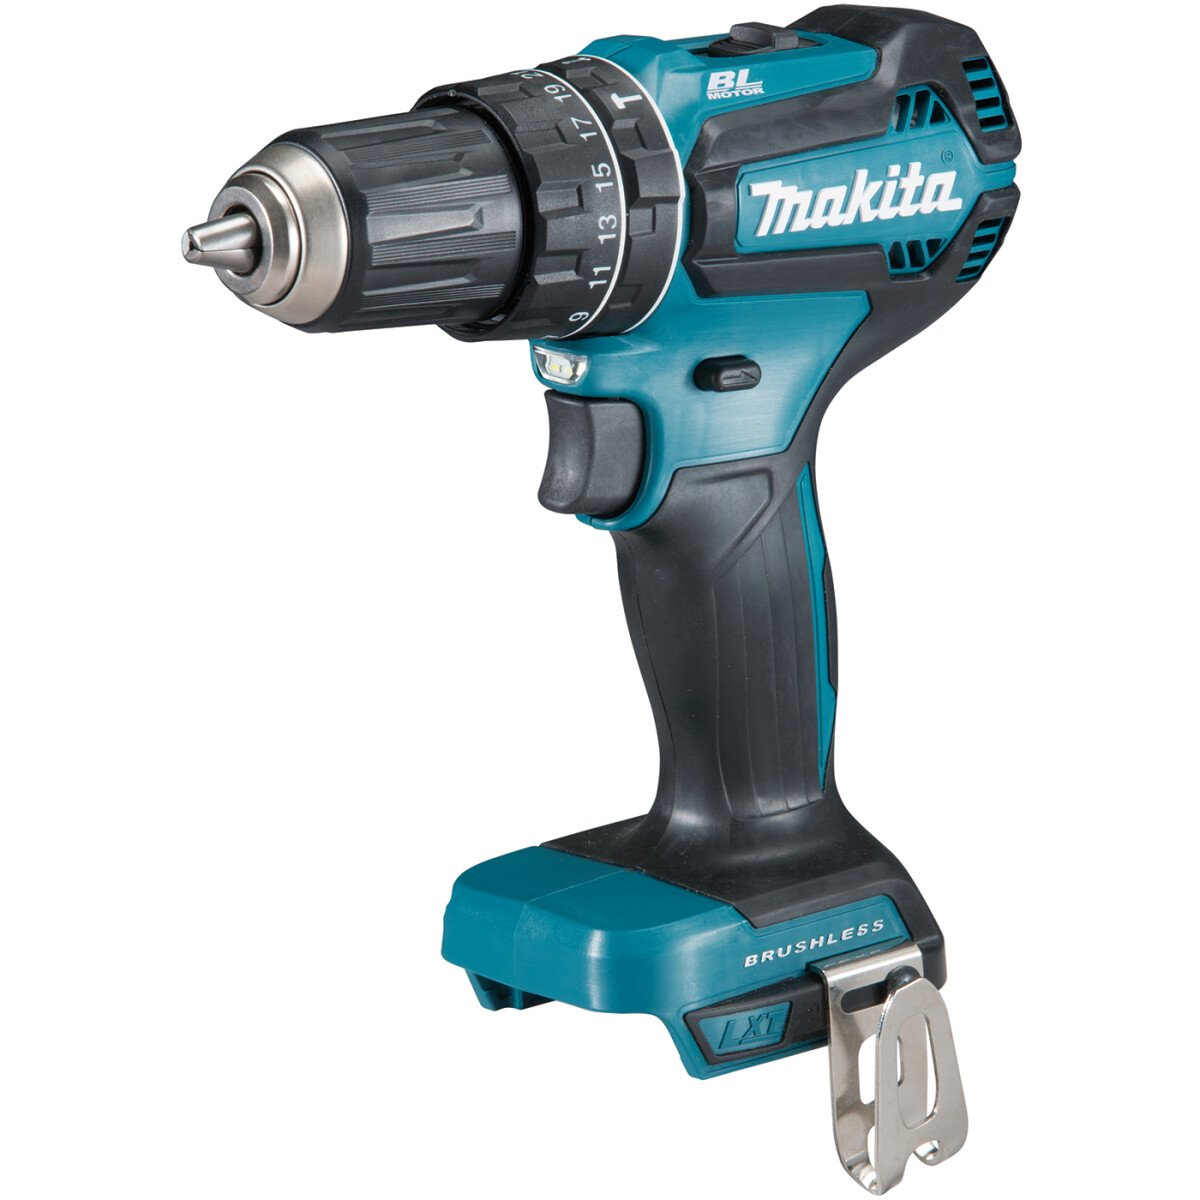 Makita DHP485Z Body Only 18V Brushless Combi Drill